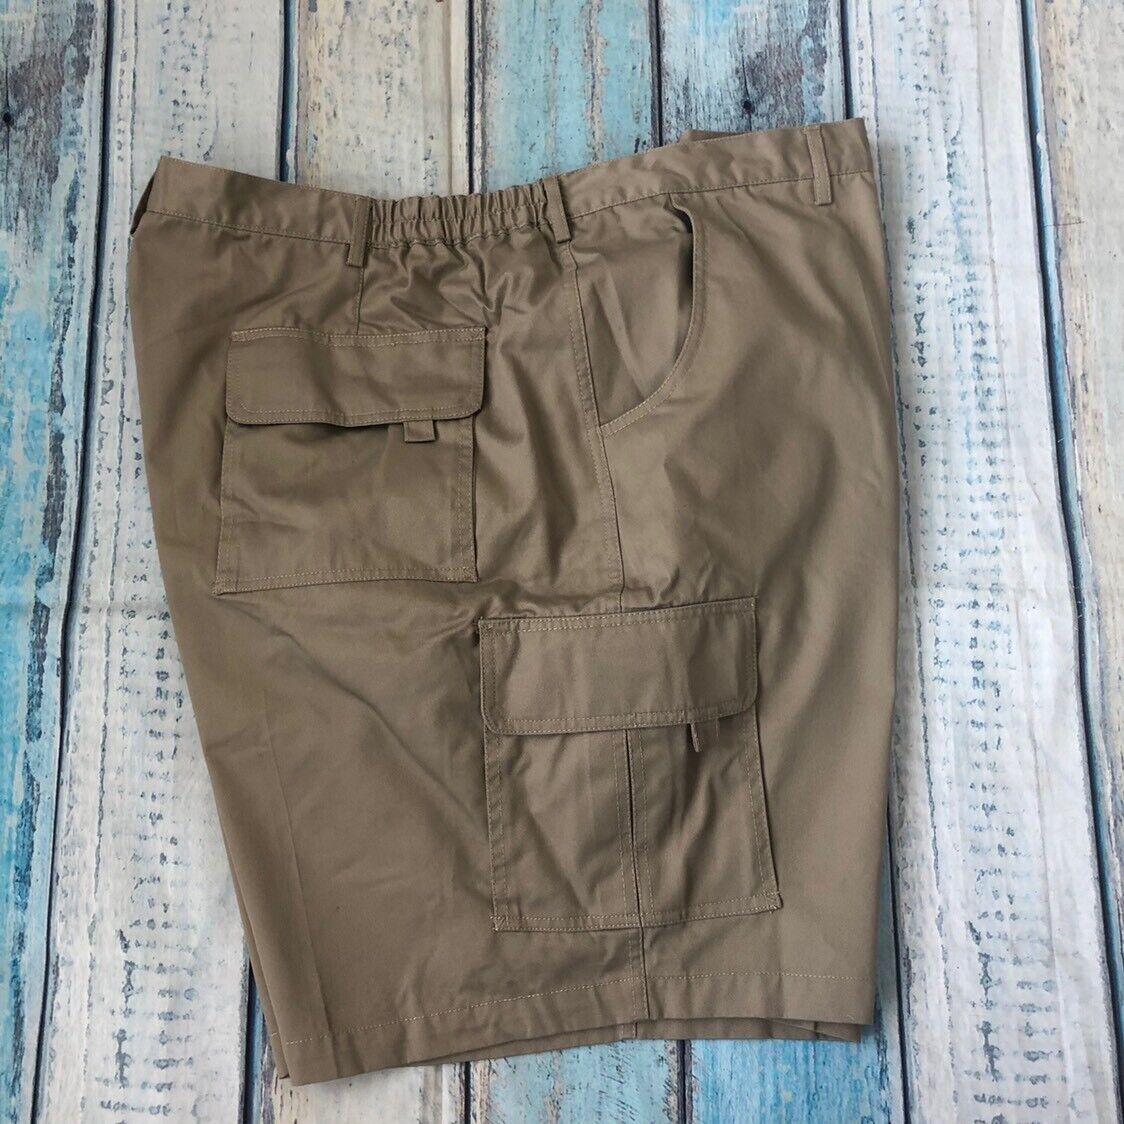 NWT Falcon Bay Sportswear Sz 52 Men's Shorts Stain Resistant Brown Cotton New